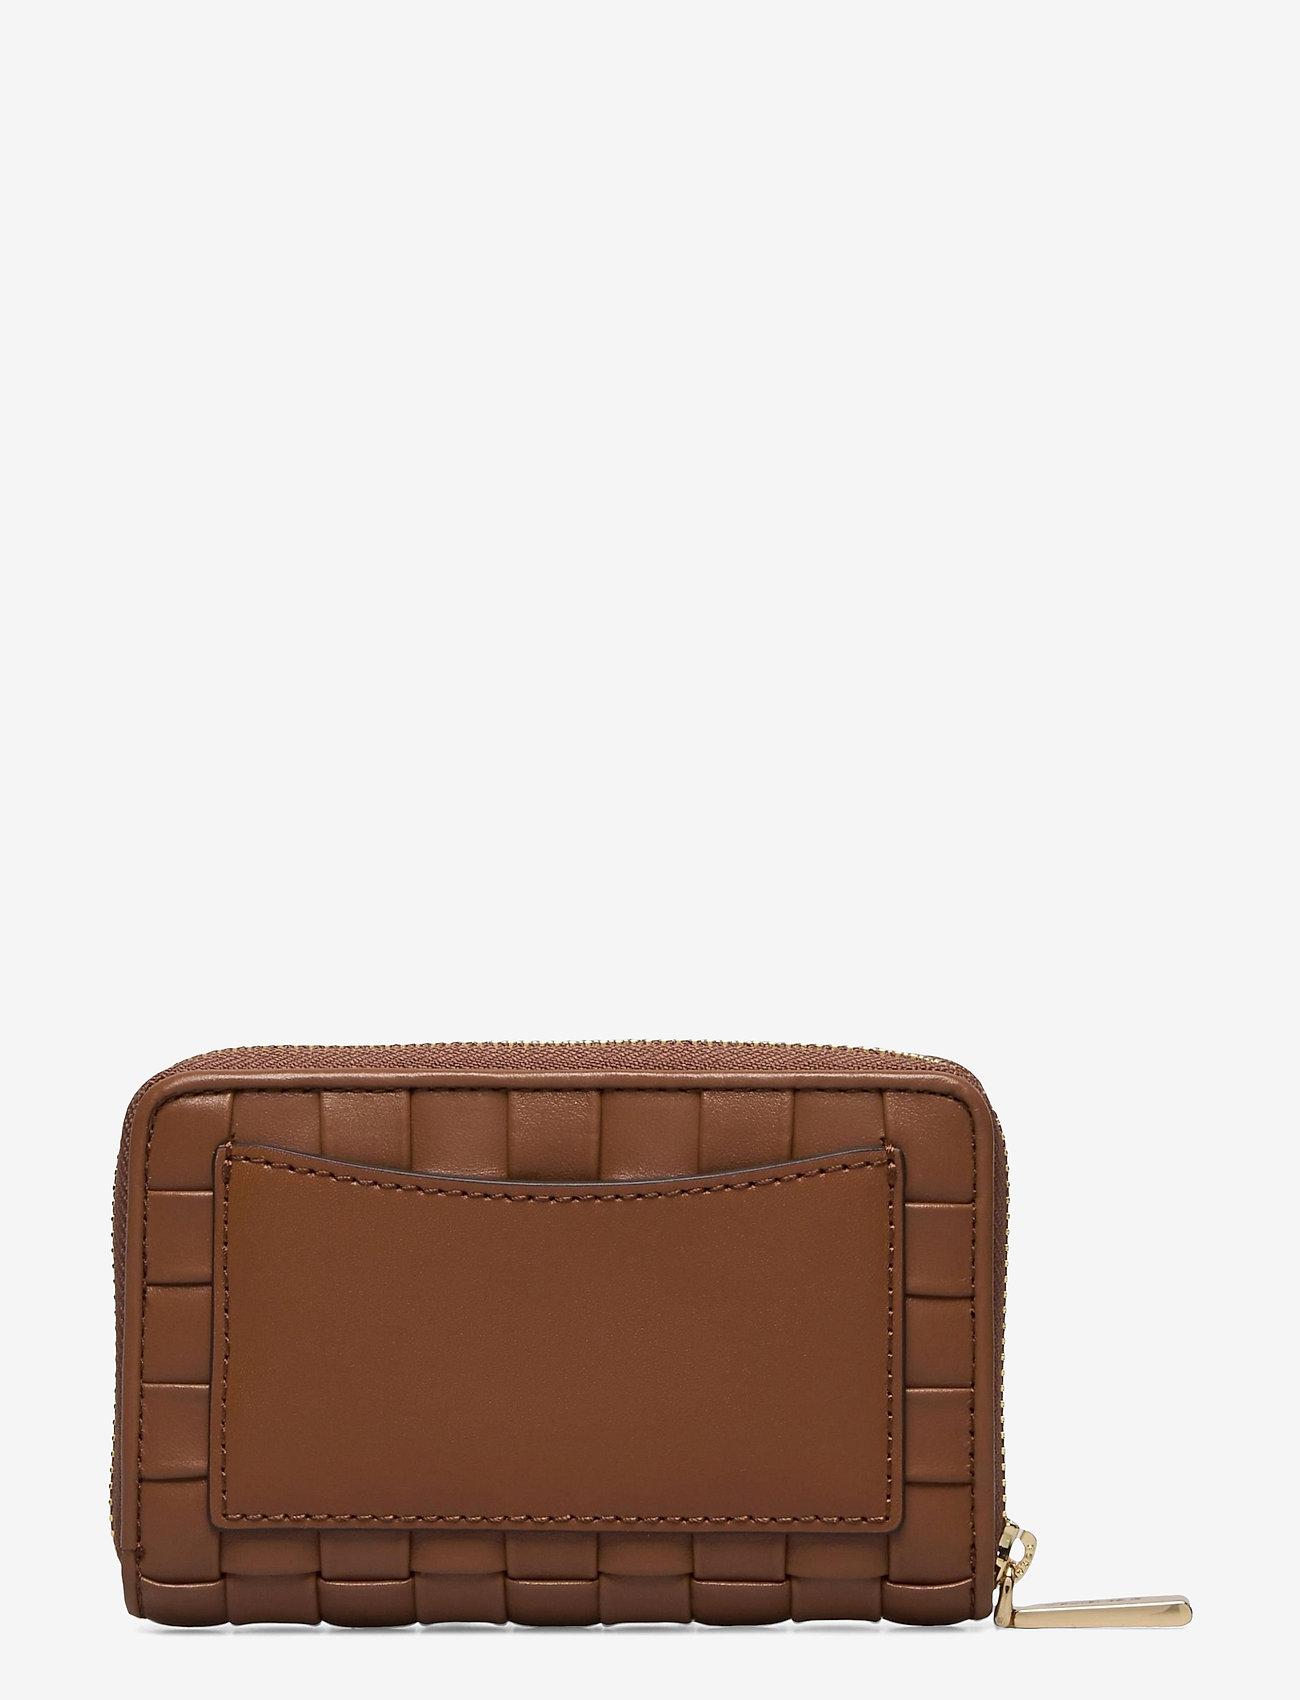 Michael Kors - SM ZA CARD CASE - kaarthouders - luggage - 1